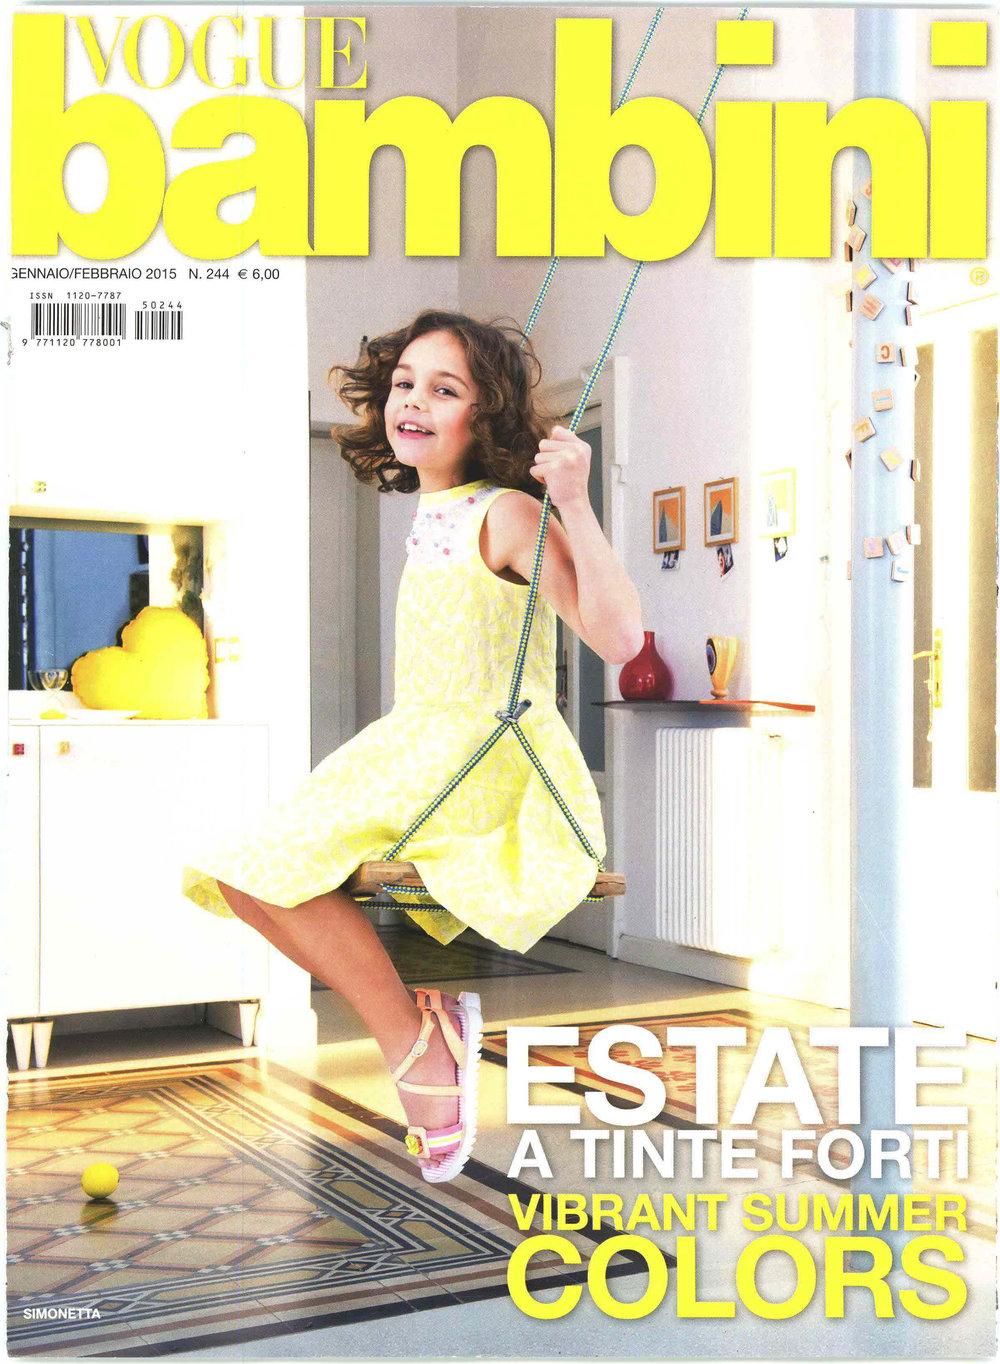 VOGUE-BAMBINI-cover-01-02-2015.jpg